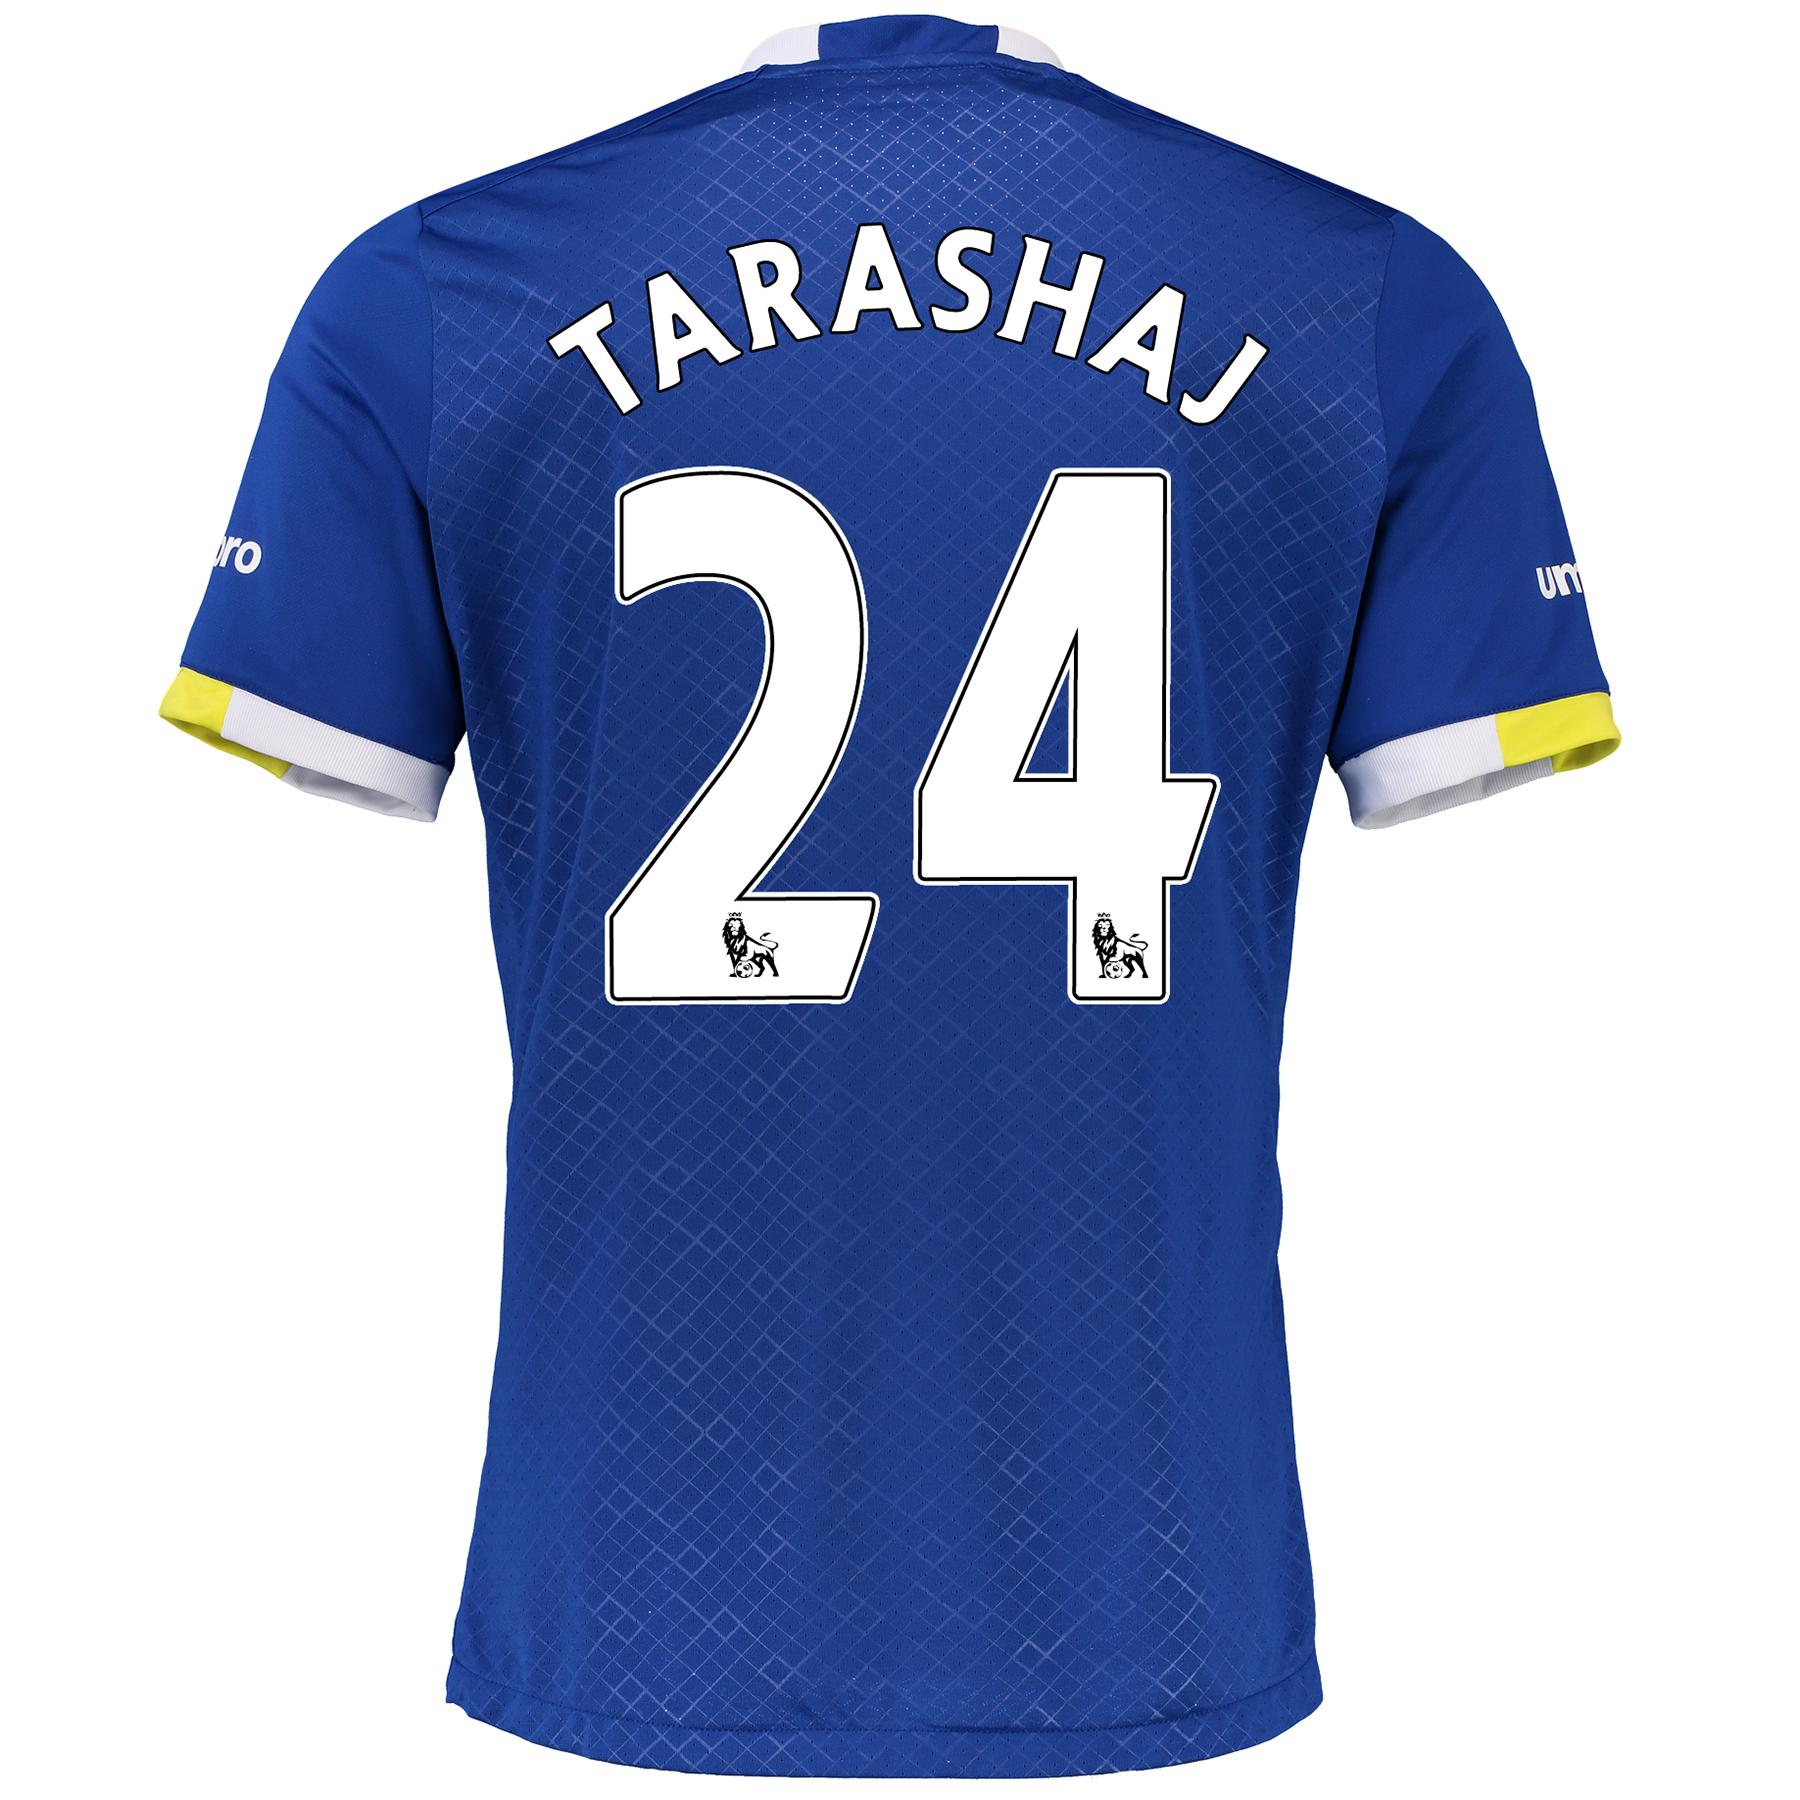 Everton Home Baby Kit 2016/17 with Tarashaj 24 printing